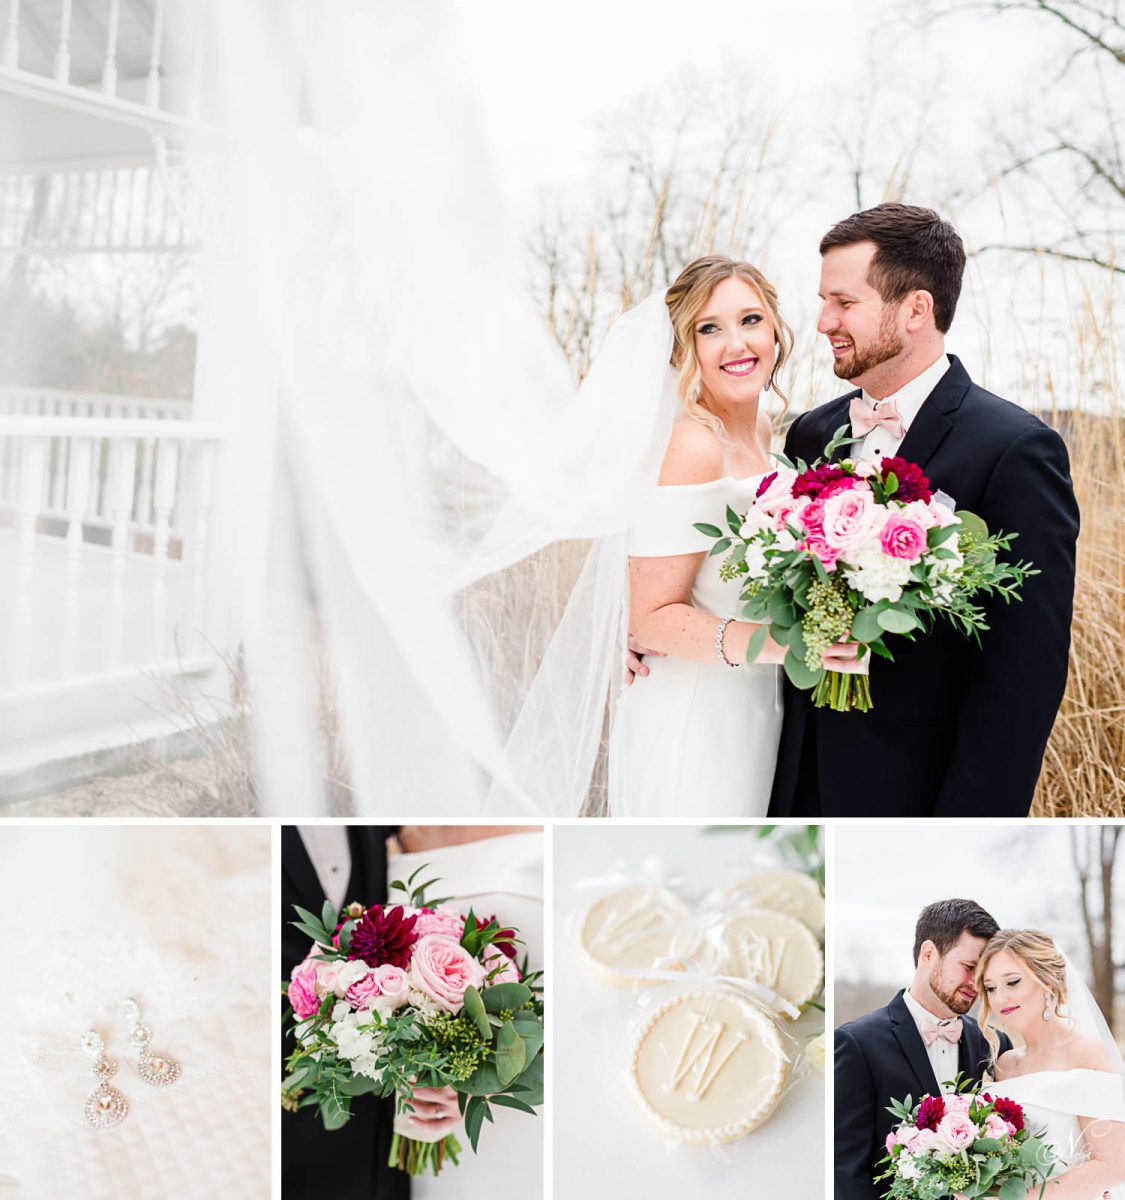 Whitestone inn winter wedding